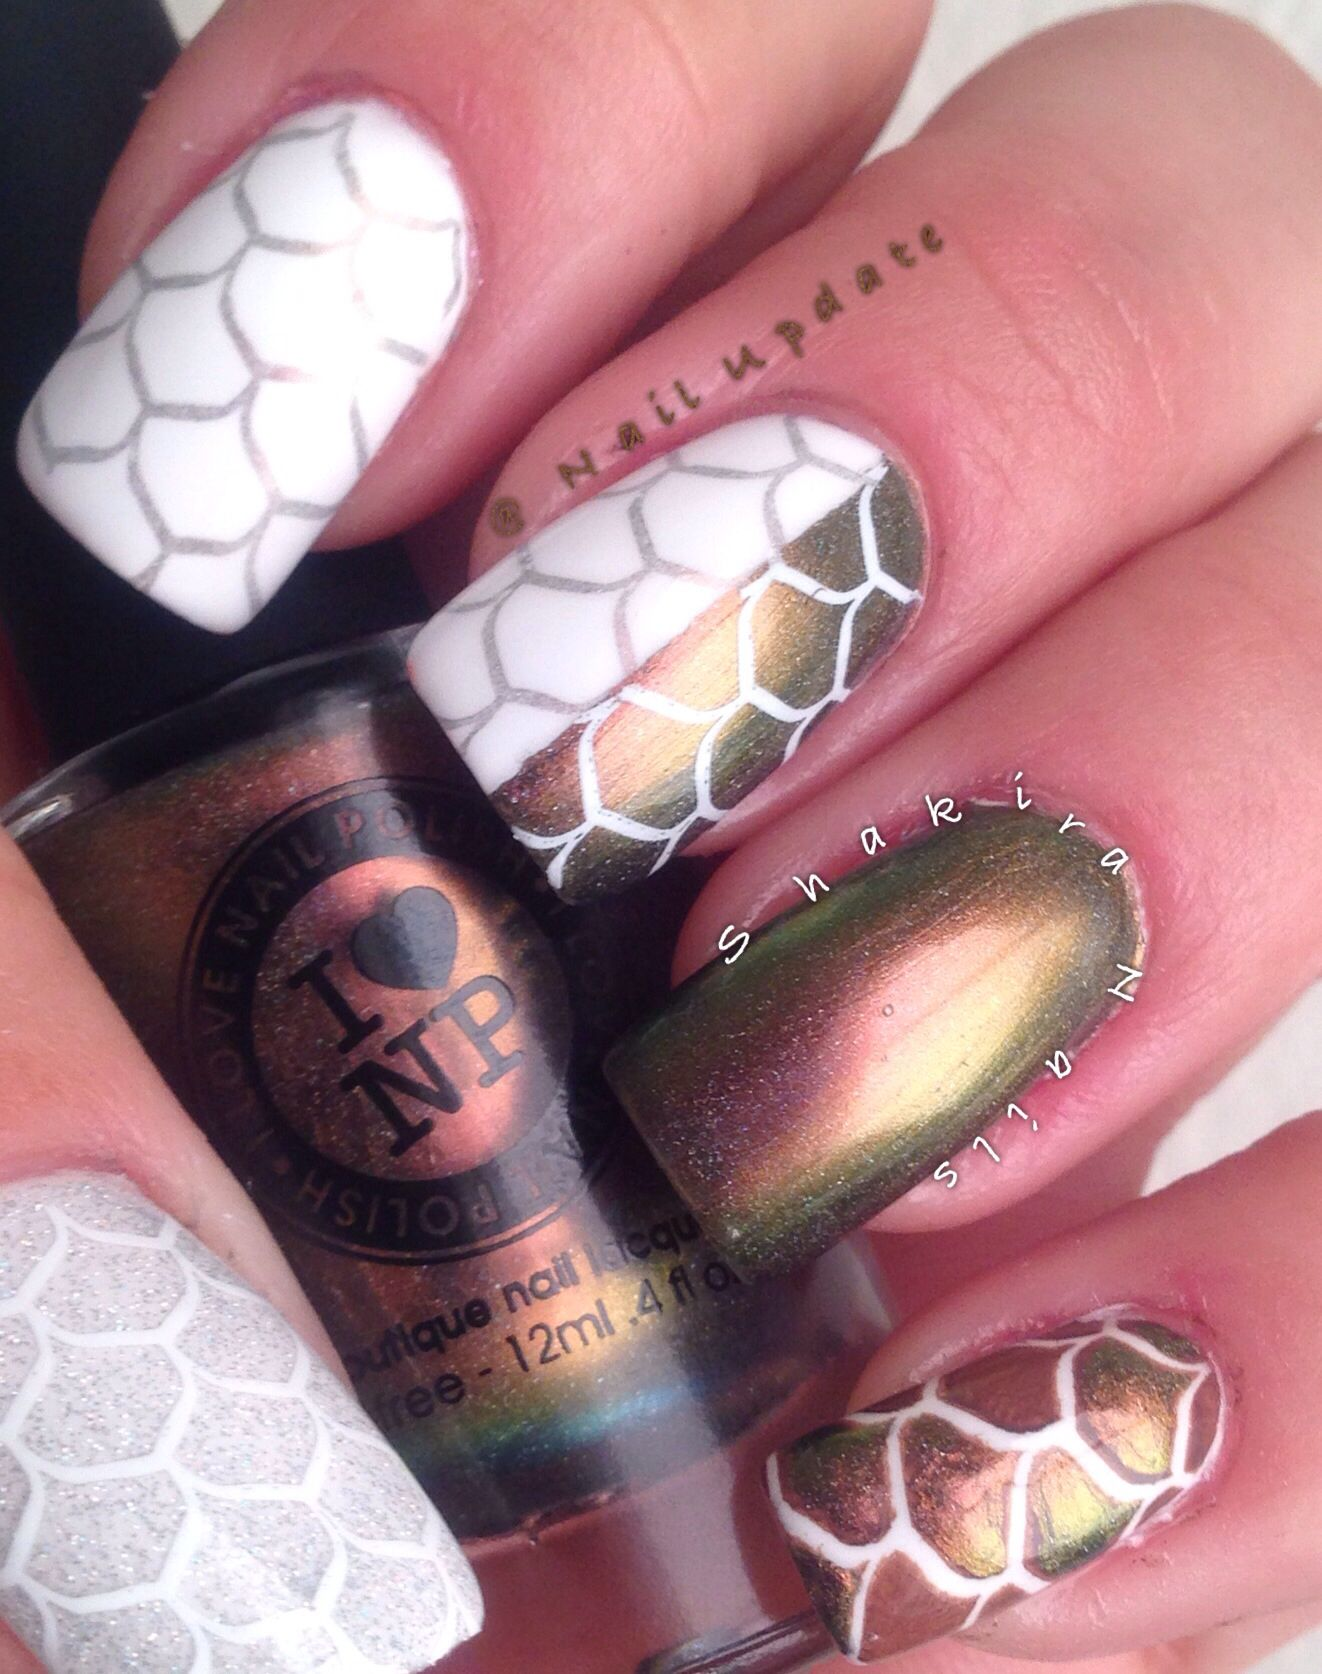 Dragon Nails #inlp #notagolia #NailUpdate #VL | Nails | Pinterest